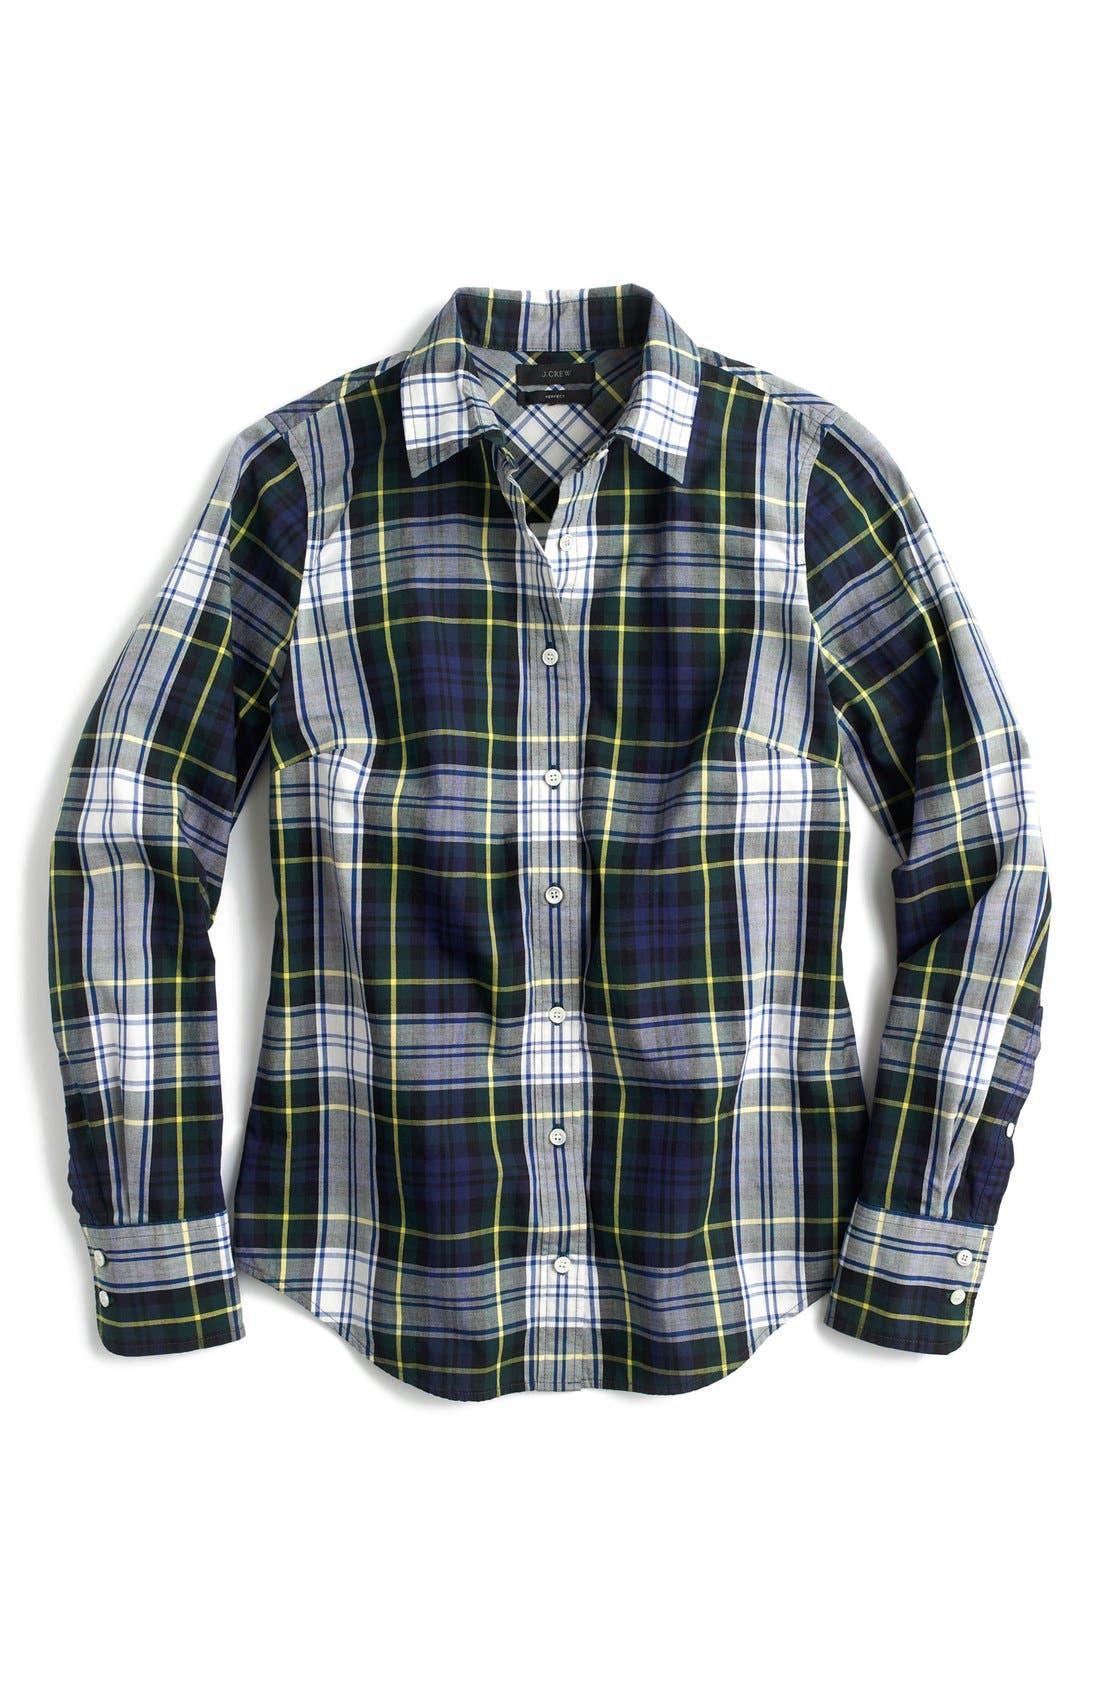 Navy Stewart Plaid Perfect Shirt,                             Alternate thumbnail 3, color,                             400